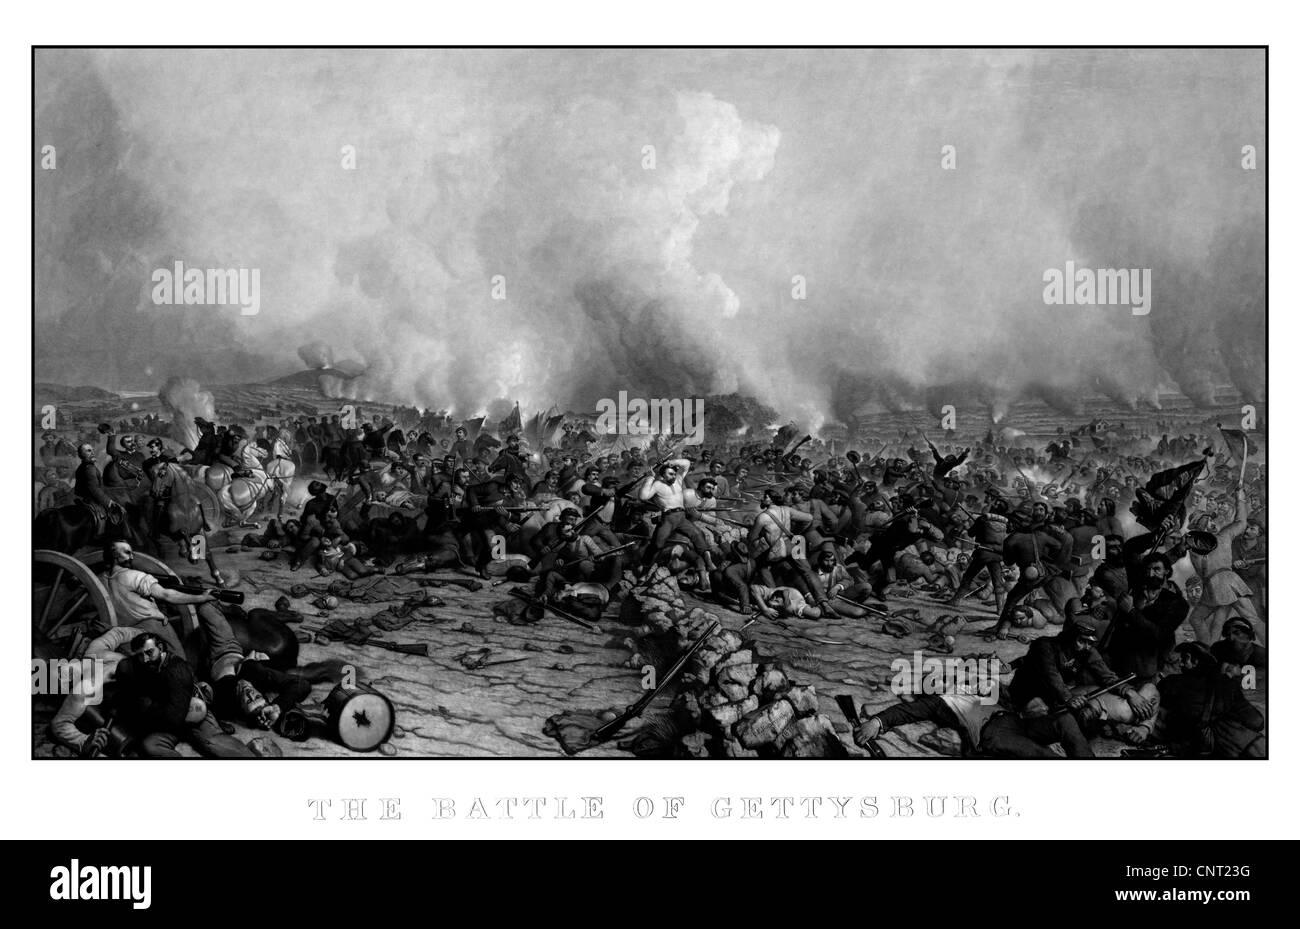 Digitally restored vintage Civil War print of the Battle of Gettysburg. - Stock Image